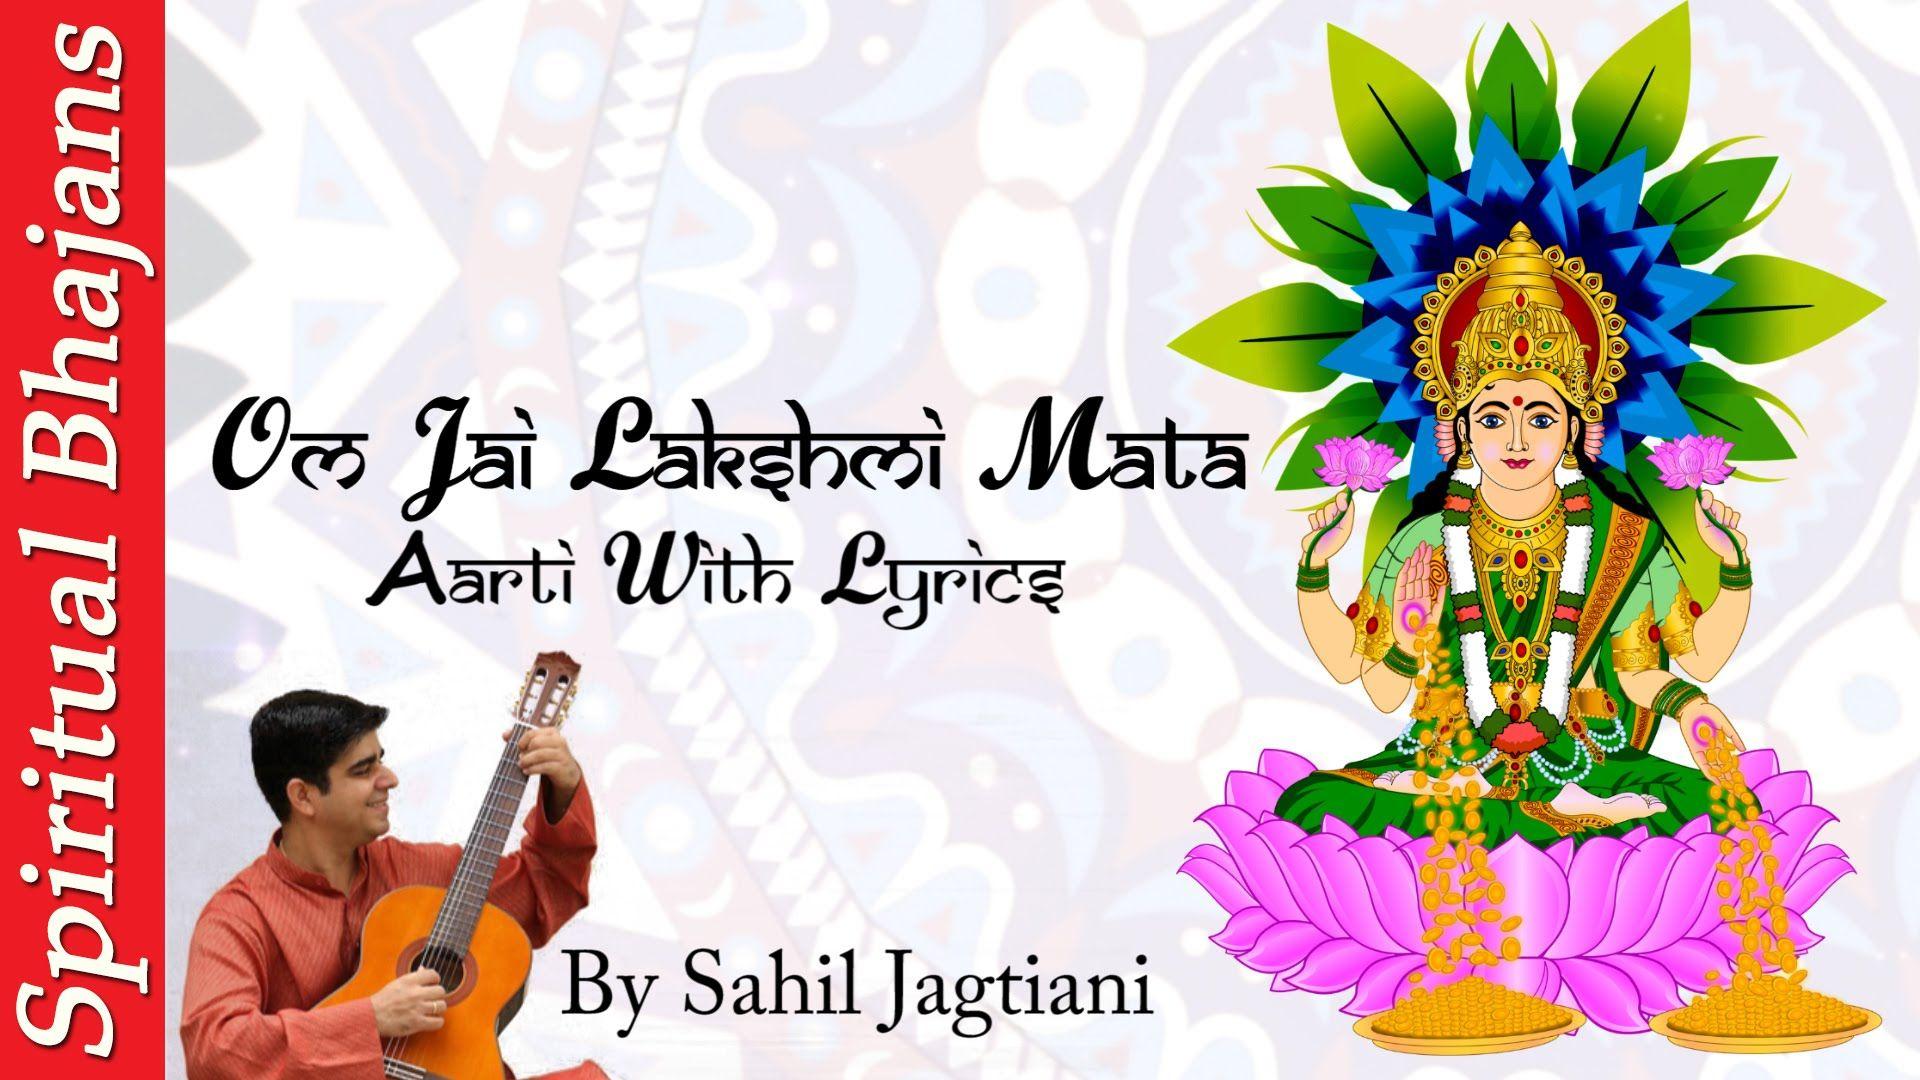 Om Jai Lakshmi Mata Aarti With Lyrics In English